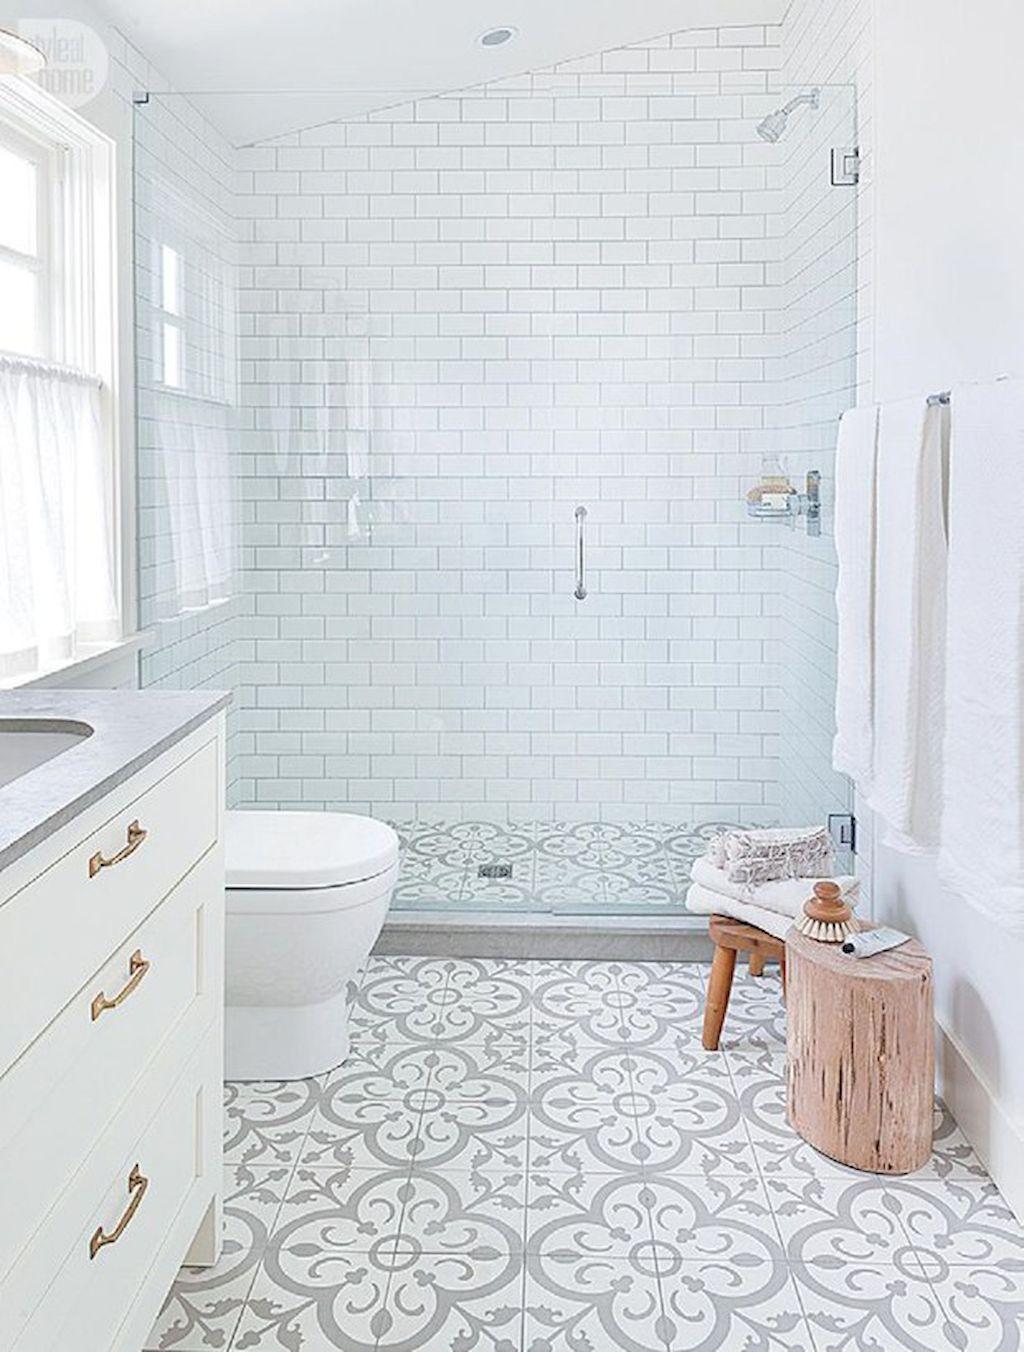 Luxury subway tile shower designs ideas (71) | Bathroom remodel ...